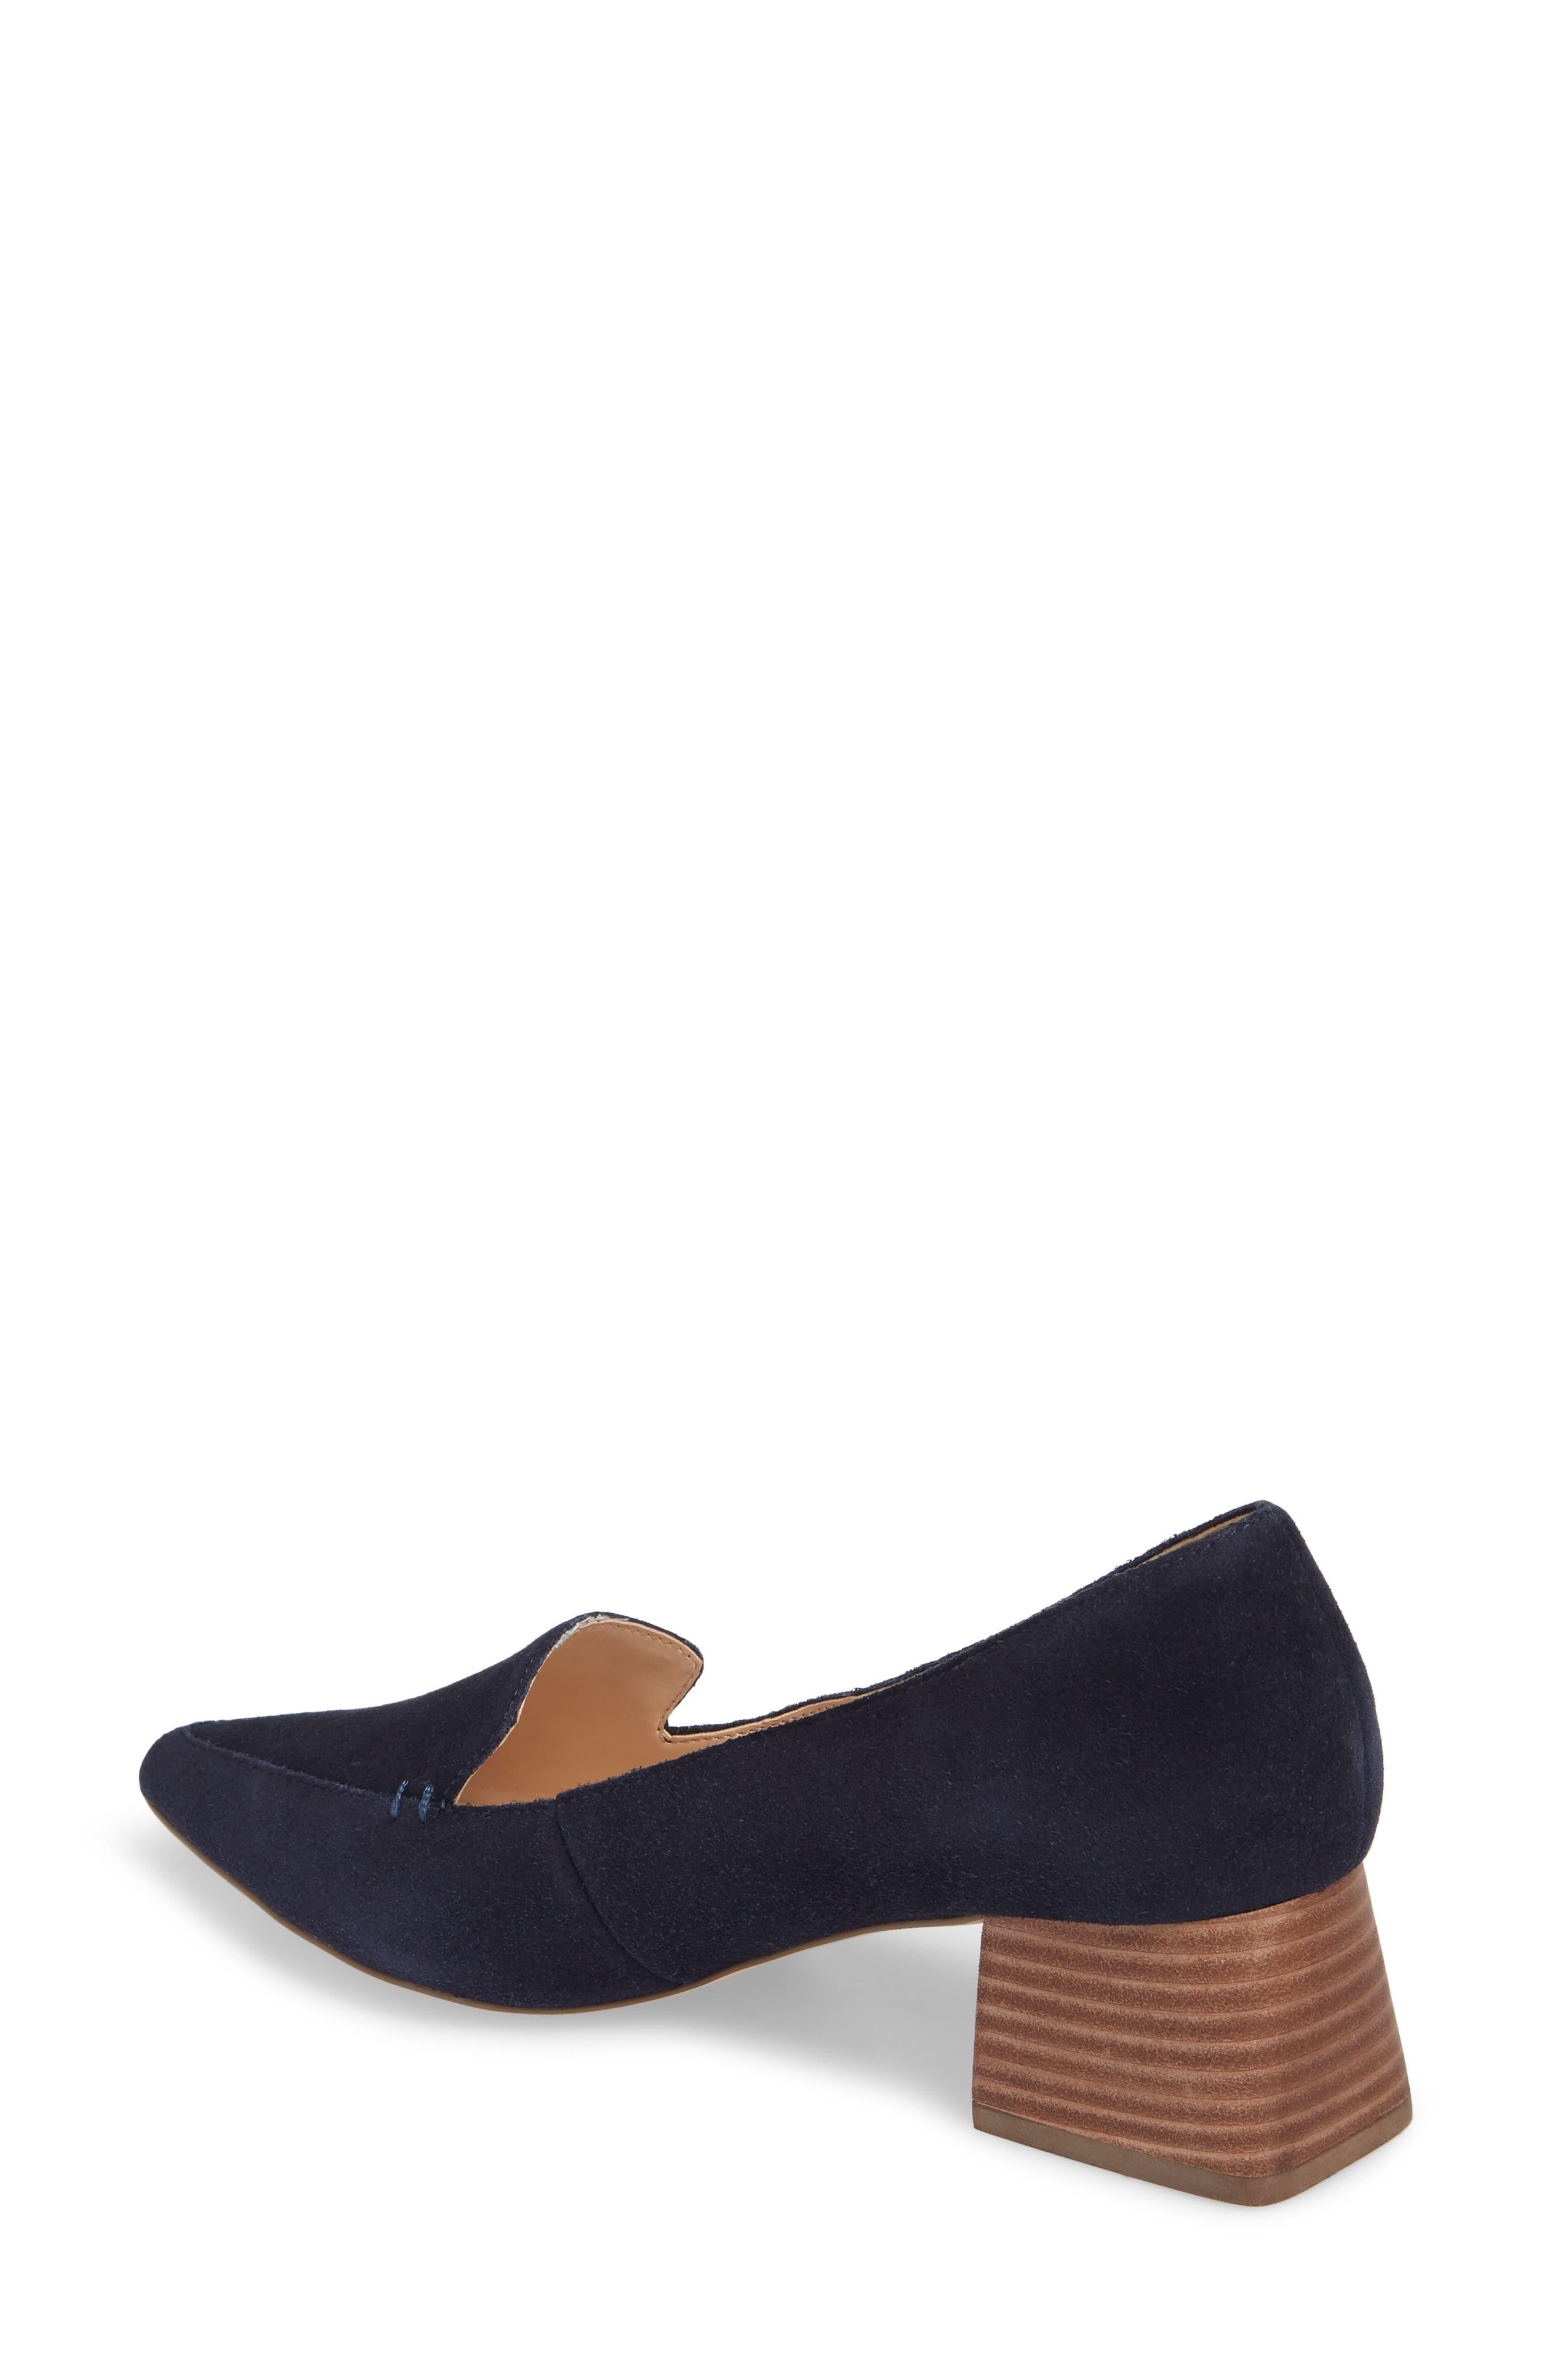 SOLE SOCIETY, Mavis Flare Heel Loafer, Alternate thumbnail 2, color, OMBRE BLUE